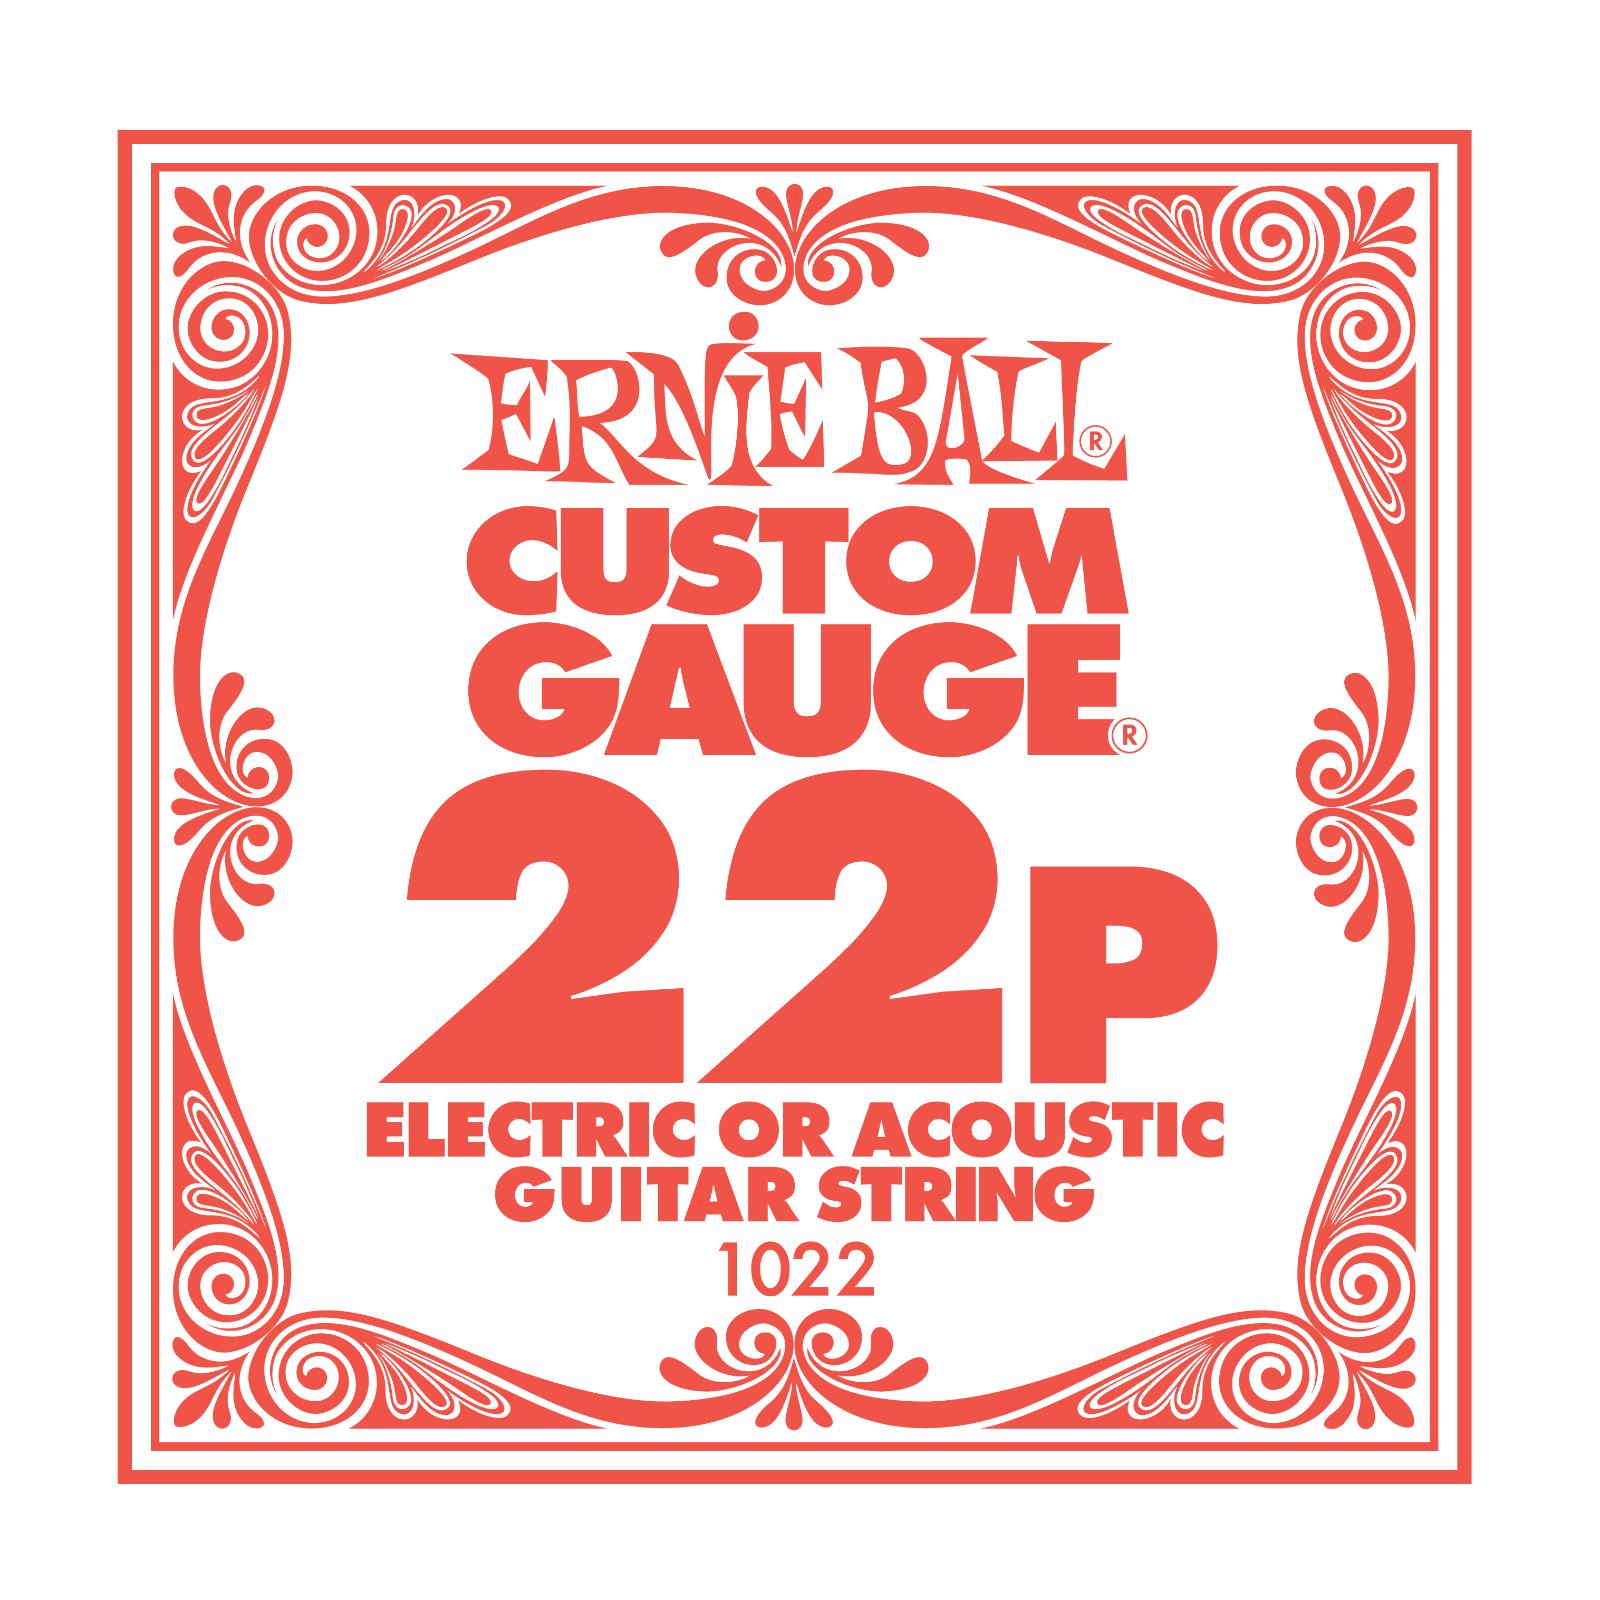 Ernie Ball Plain Steel Single Guitar String .022 Gauge Pack of 6 strings PO1022